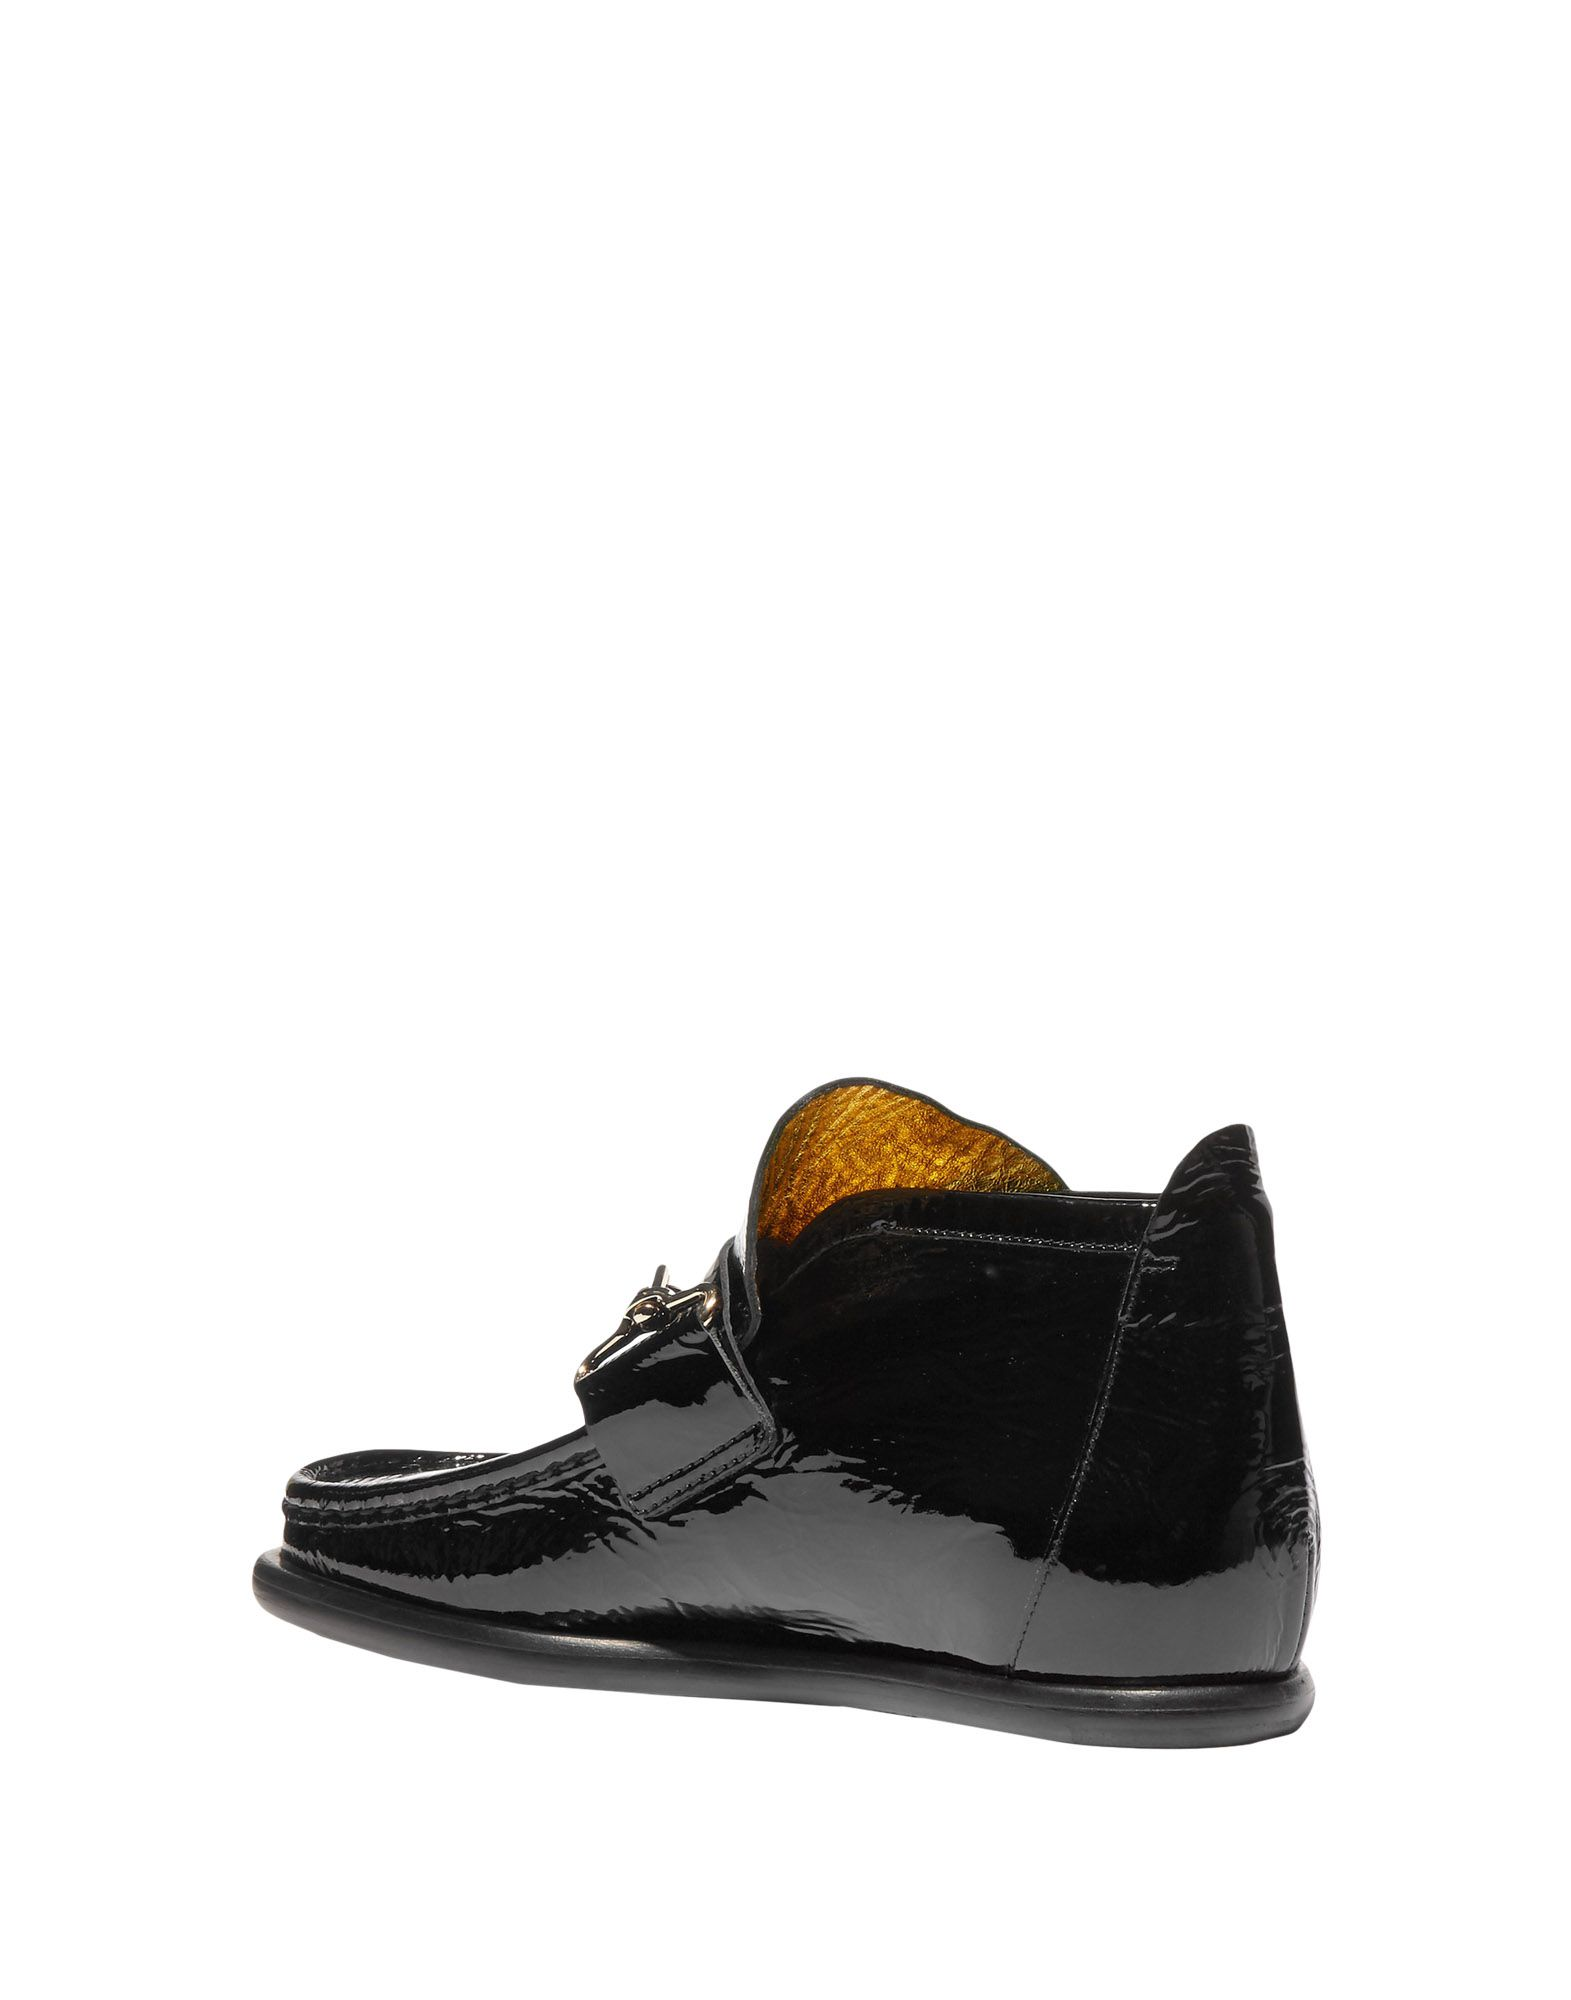 Rabatt Schuhe Acne 11517660PI Studios Mokassins Damen  11517660PI Acne fcc54d